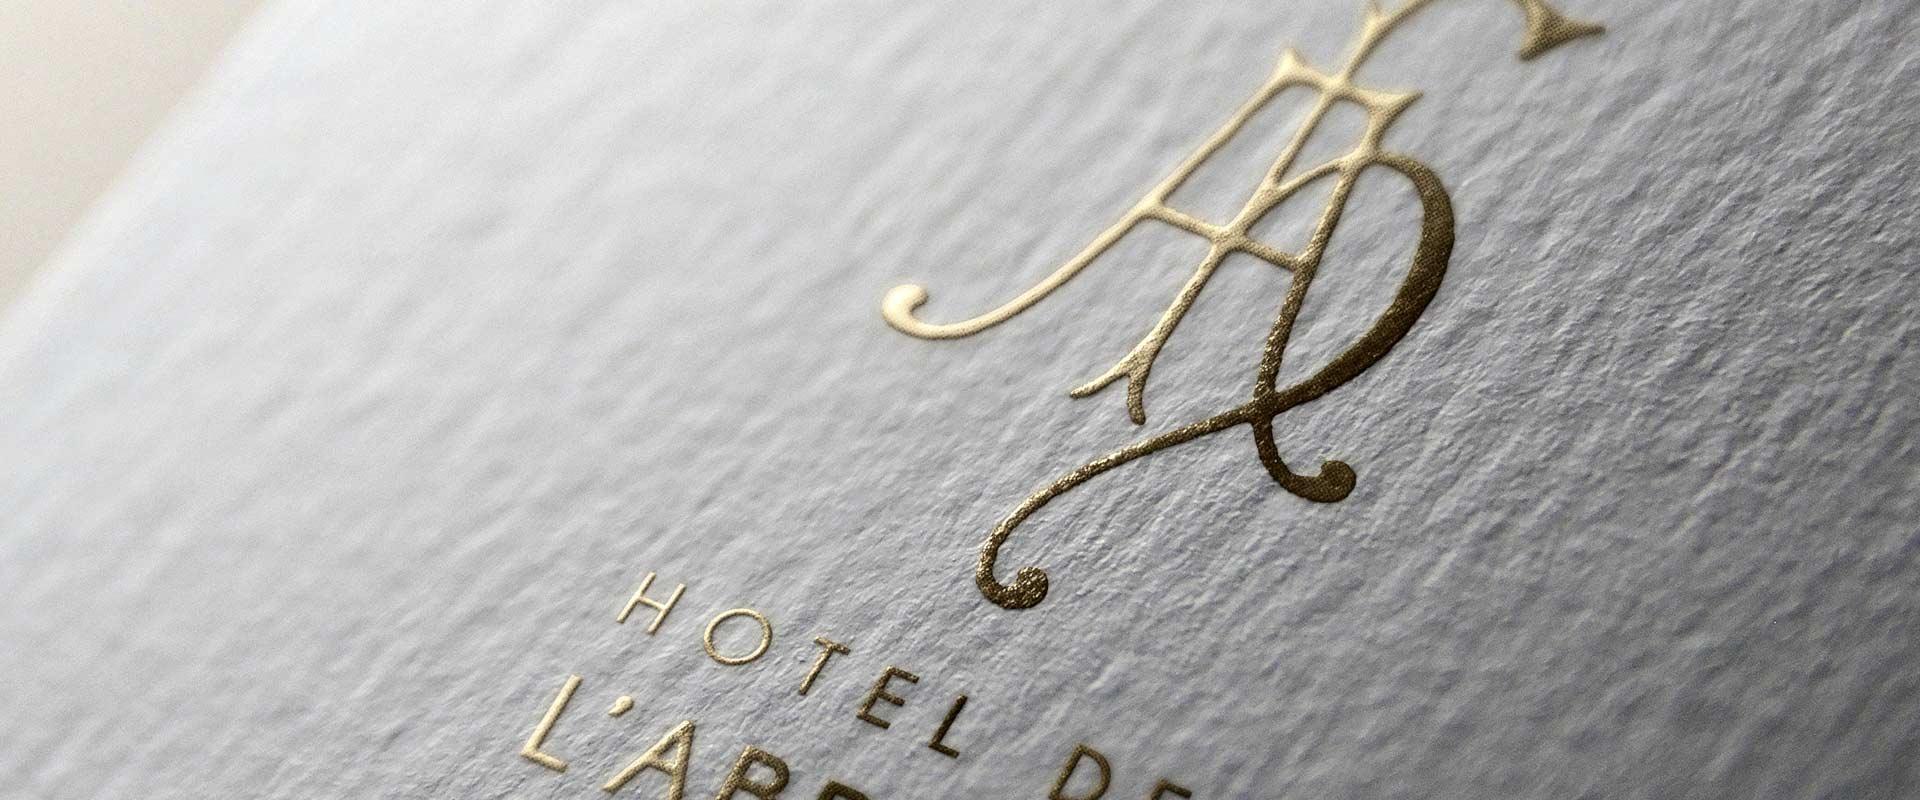 hotel 4 étoiles saint malo